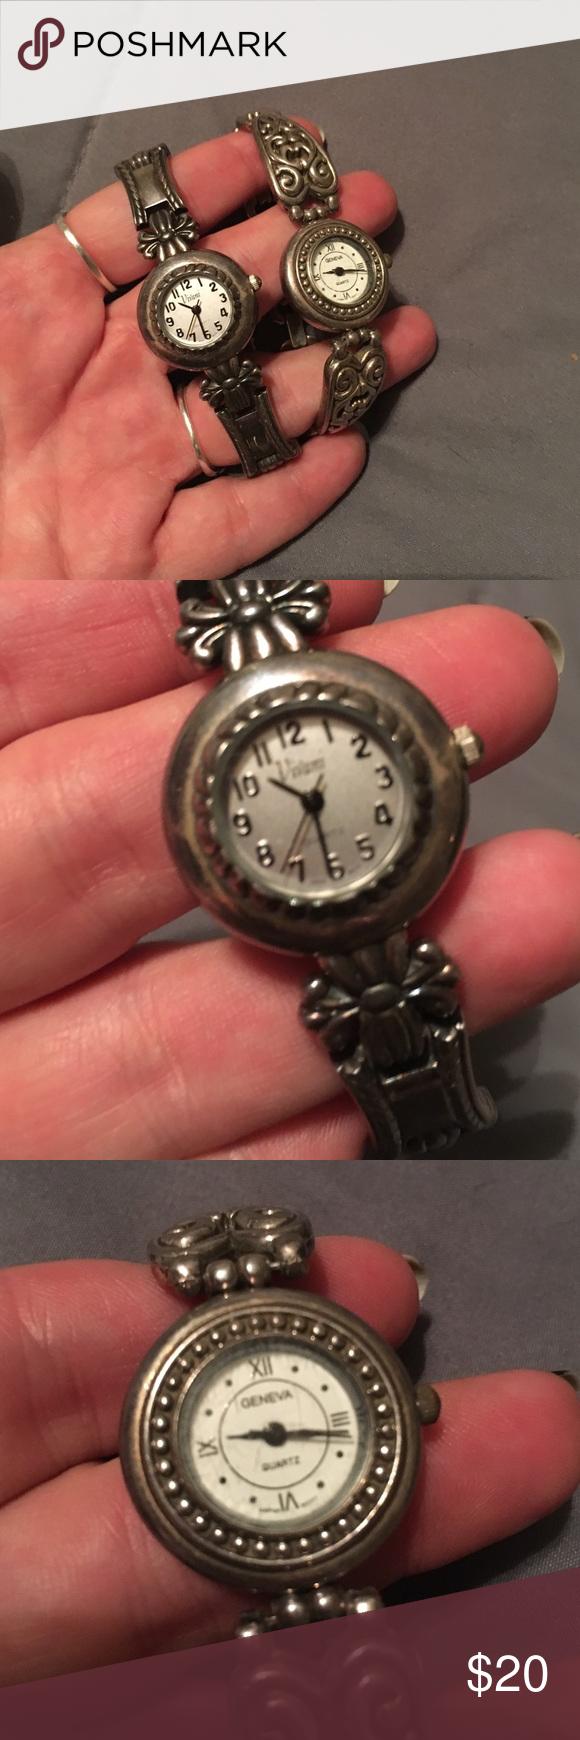 Watch Bundle One Geneva Quartz and one Vivani Quartz watch. Both in decent condition and need batteries. Accessories Watches